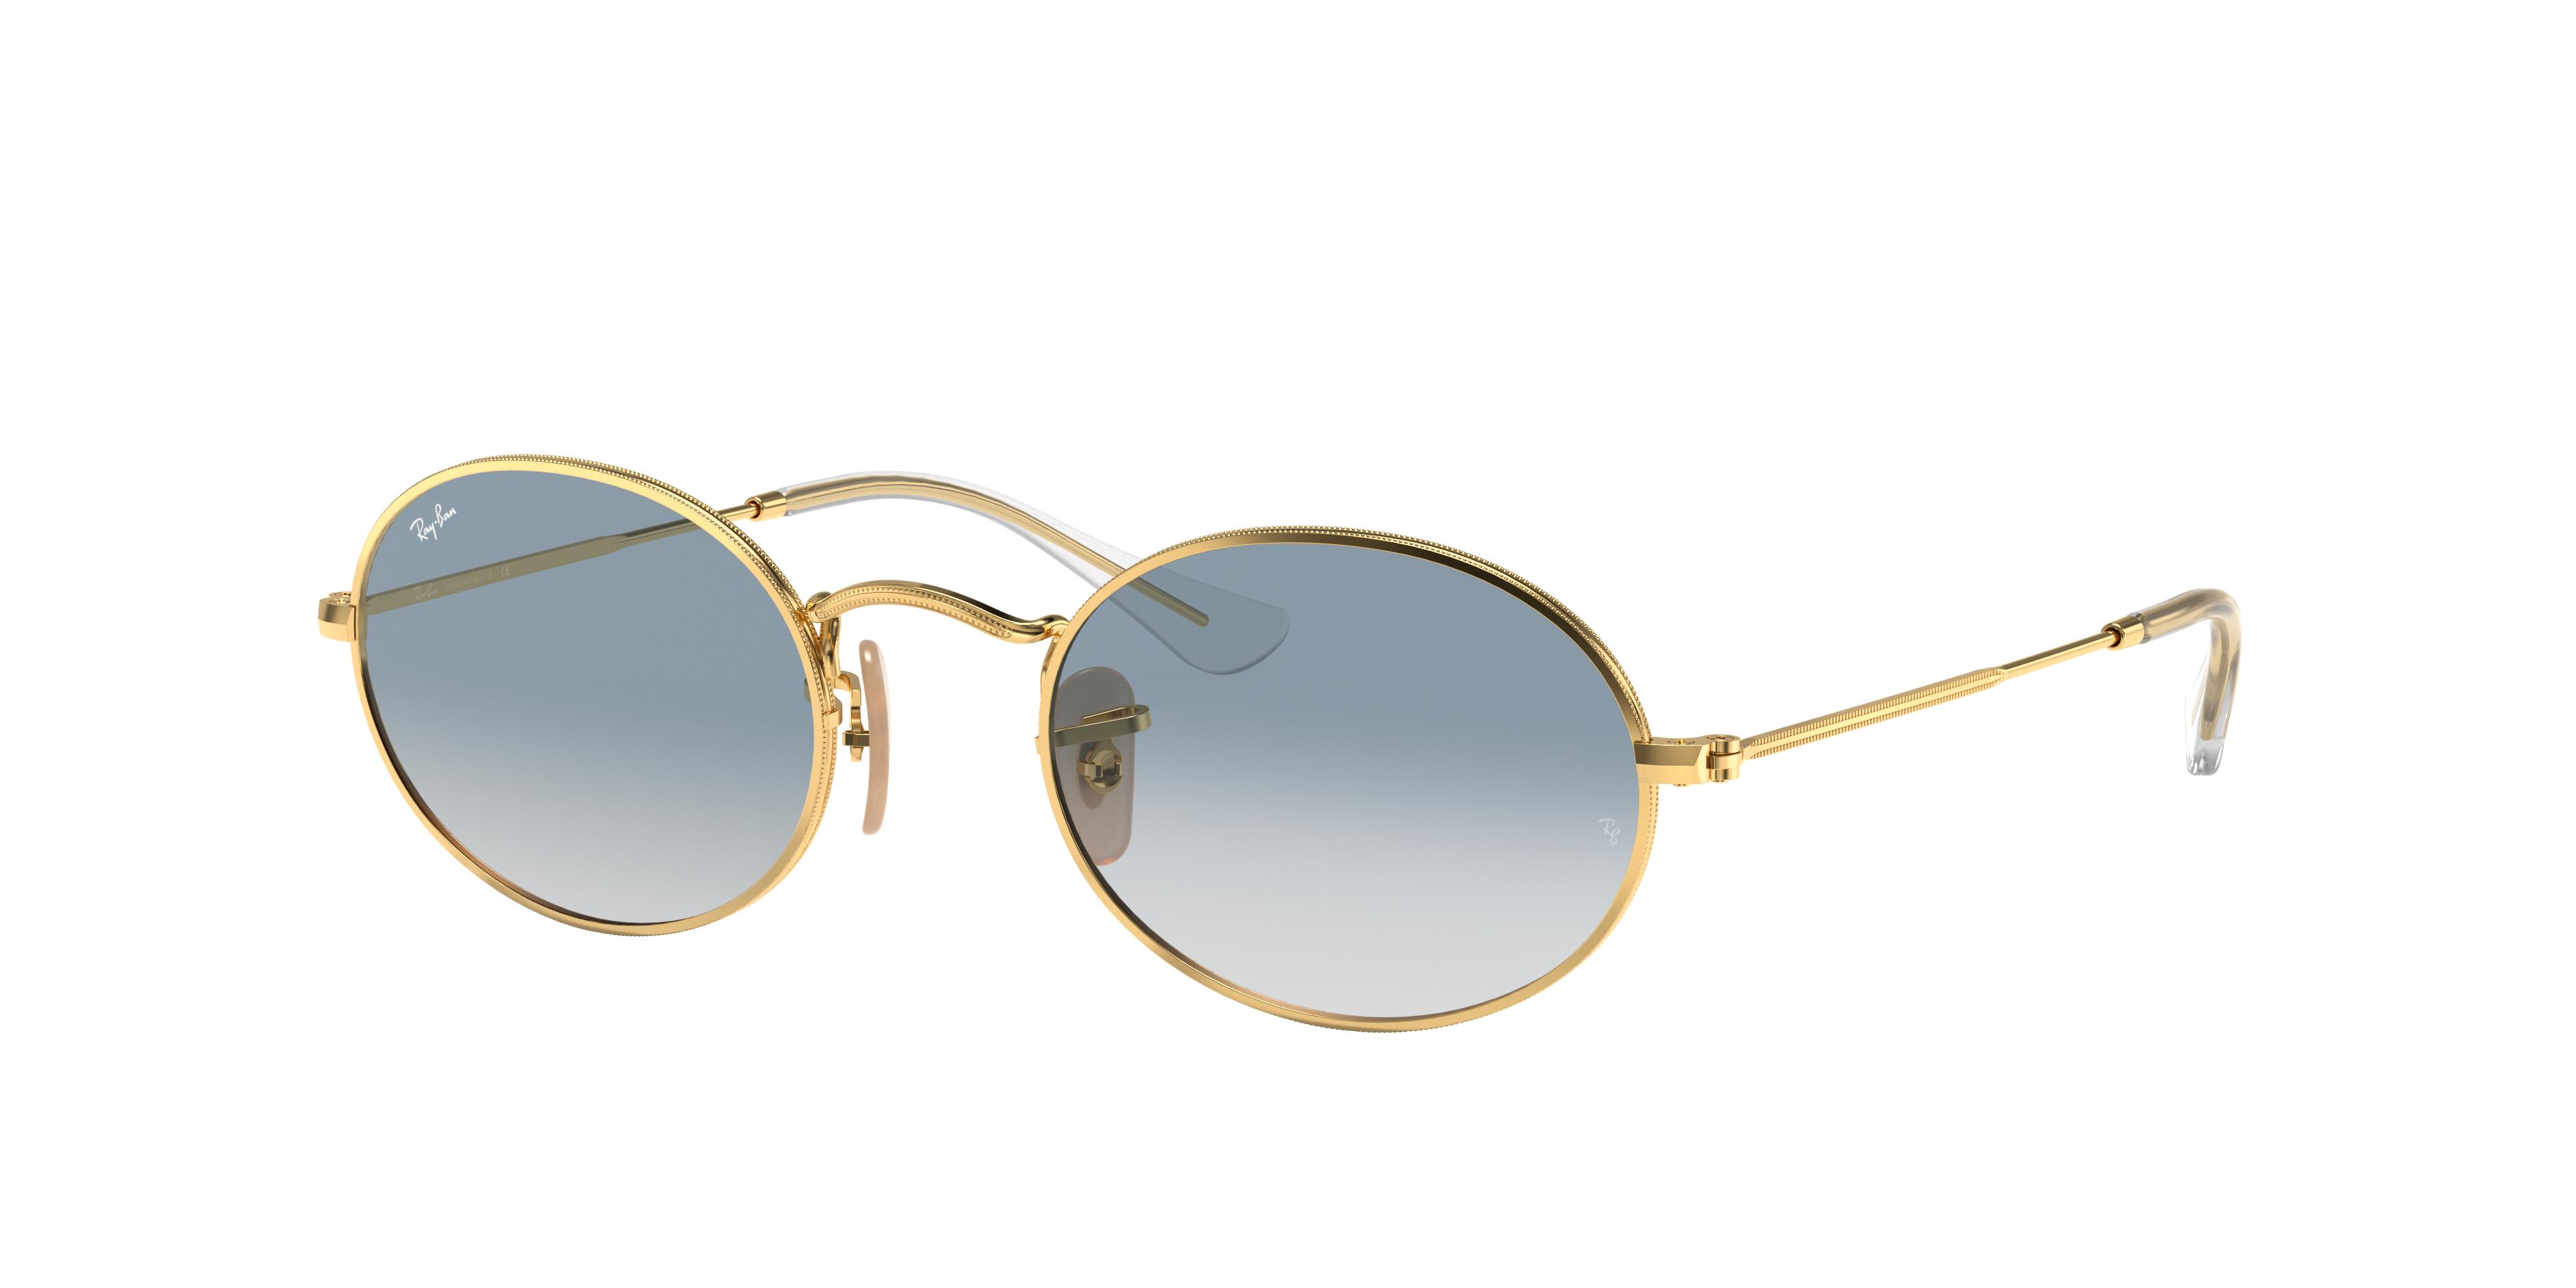 Ray-Ban Oval Flat Lenses Gold, Blue Lenses - RB3547N